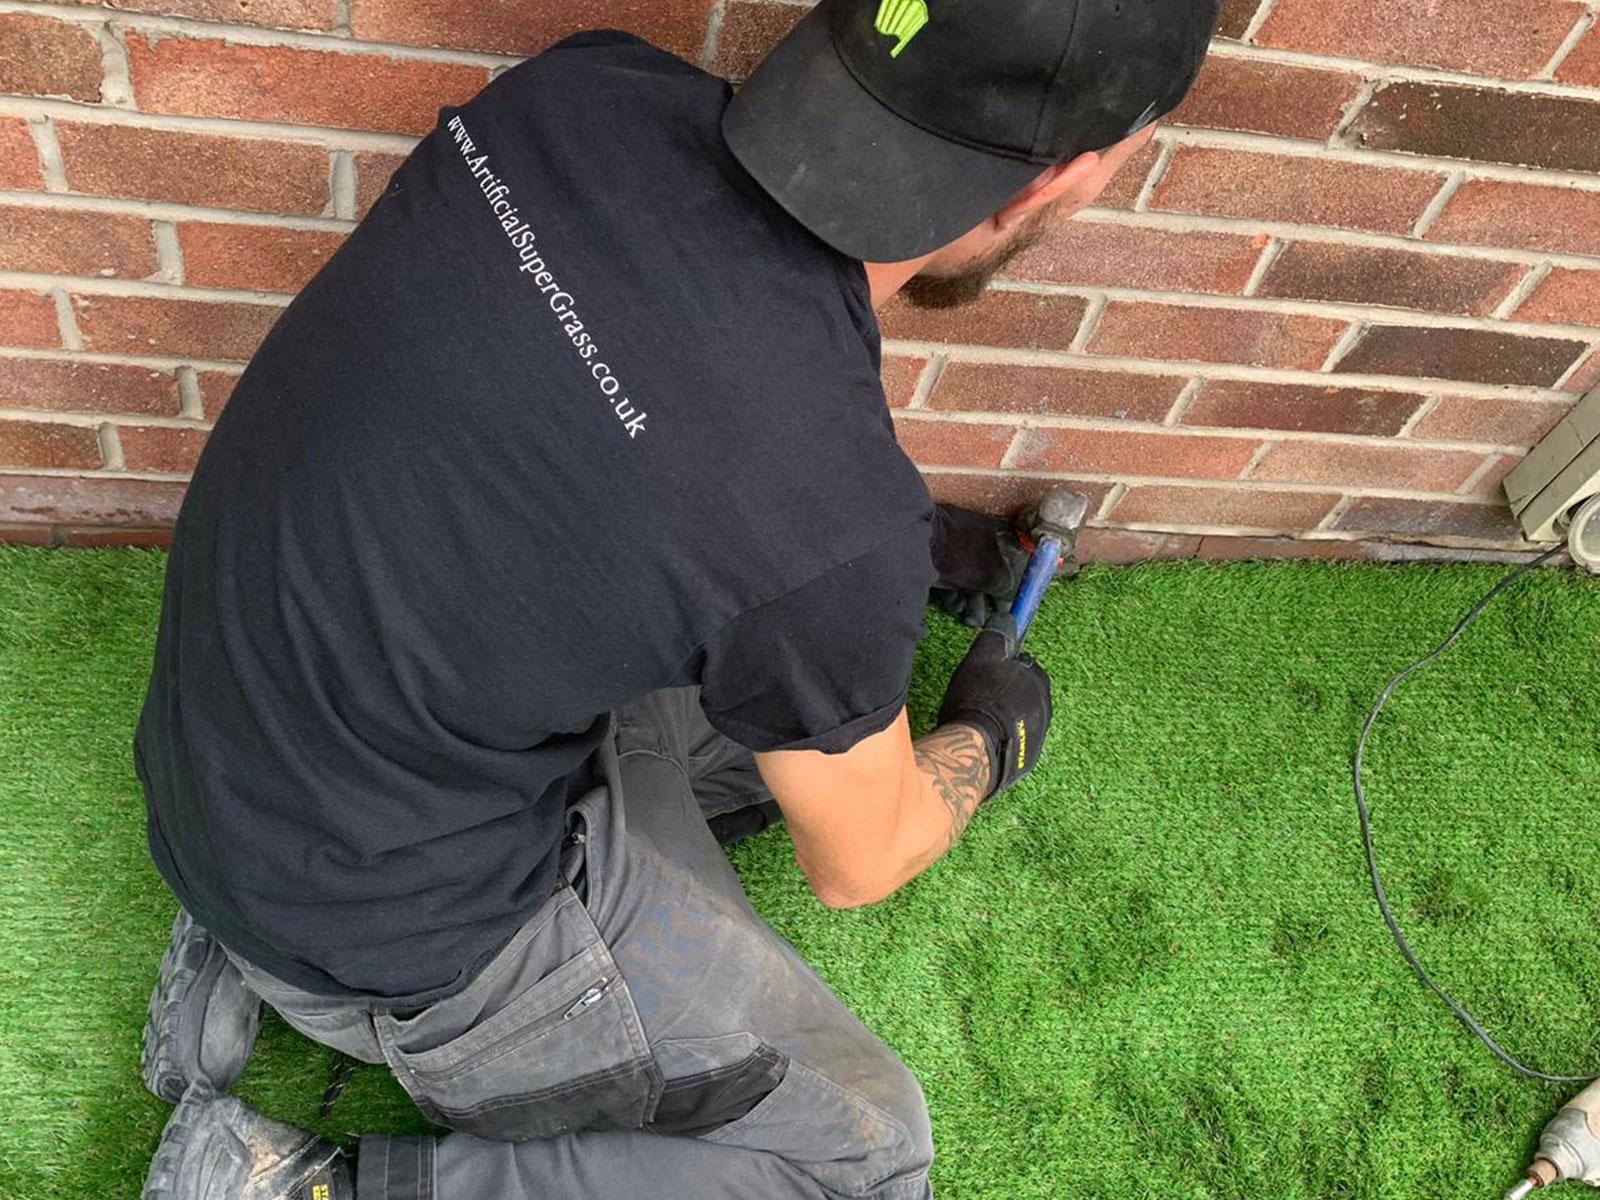 Astro Turf Aylesbury Artificial Super Grass